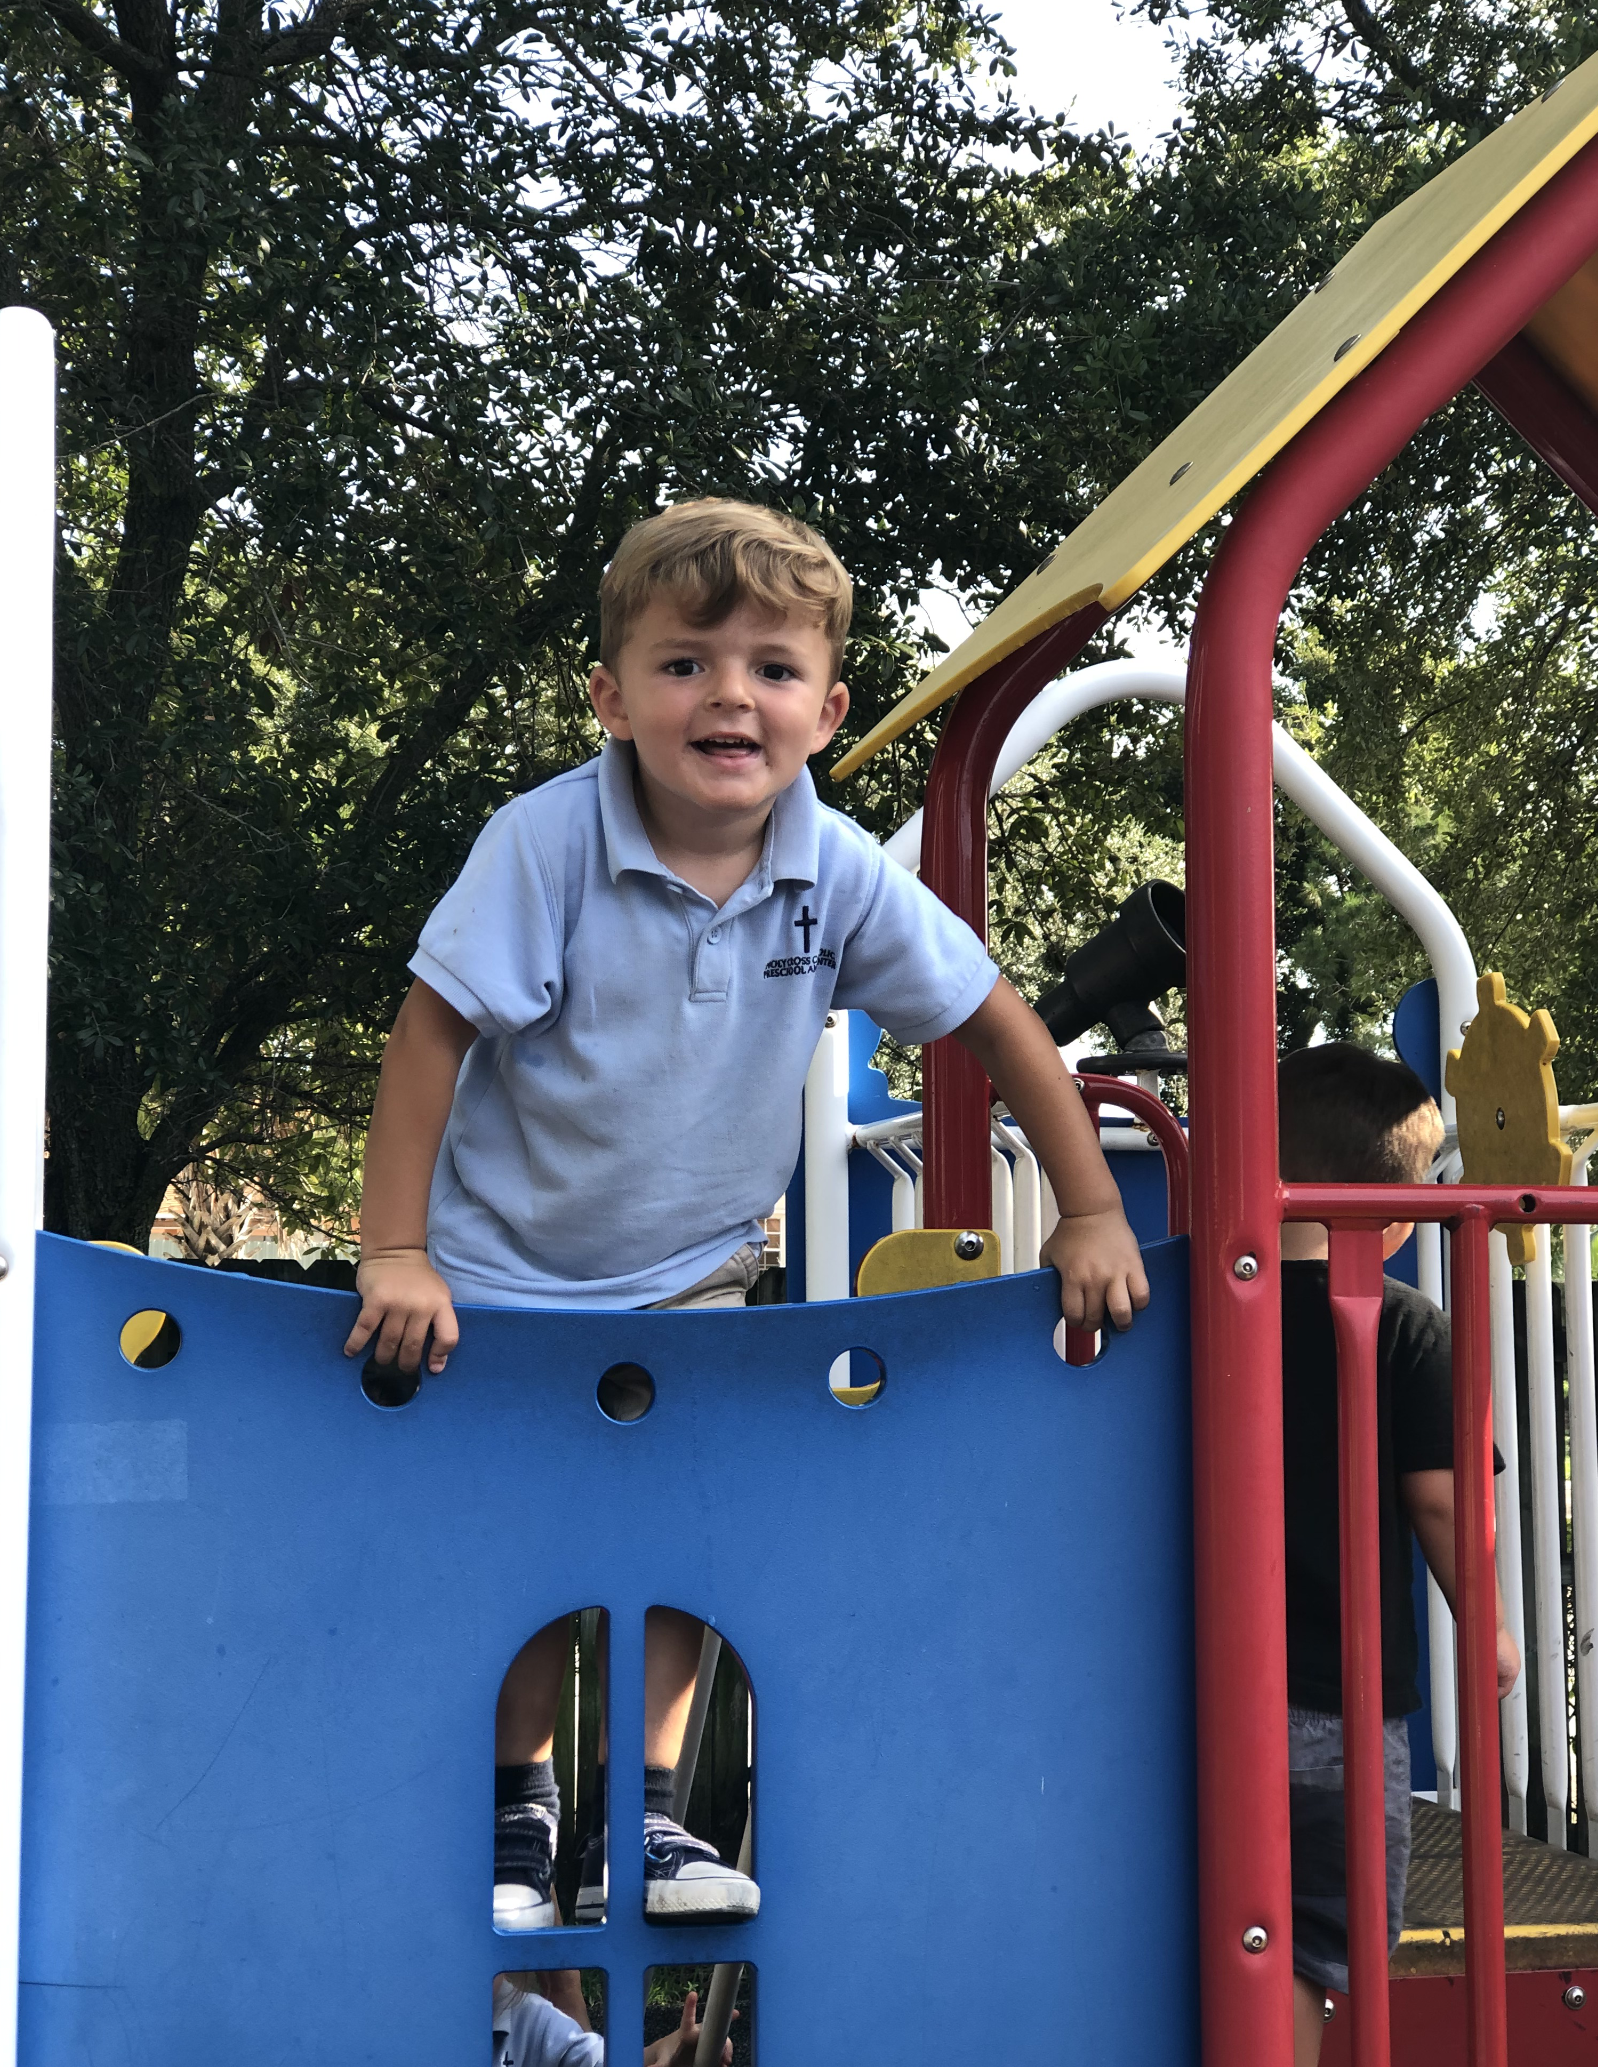 holycross-kid-in-playground